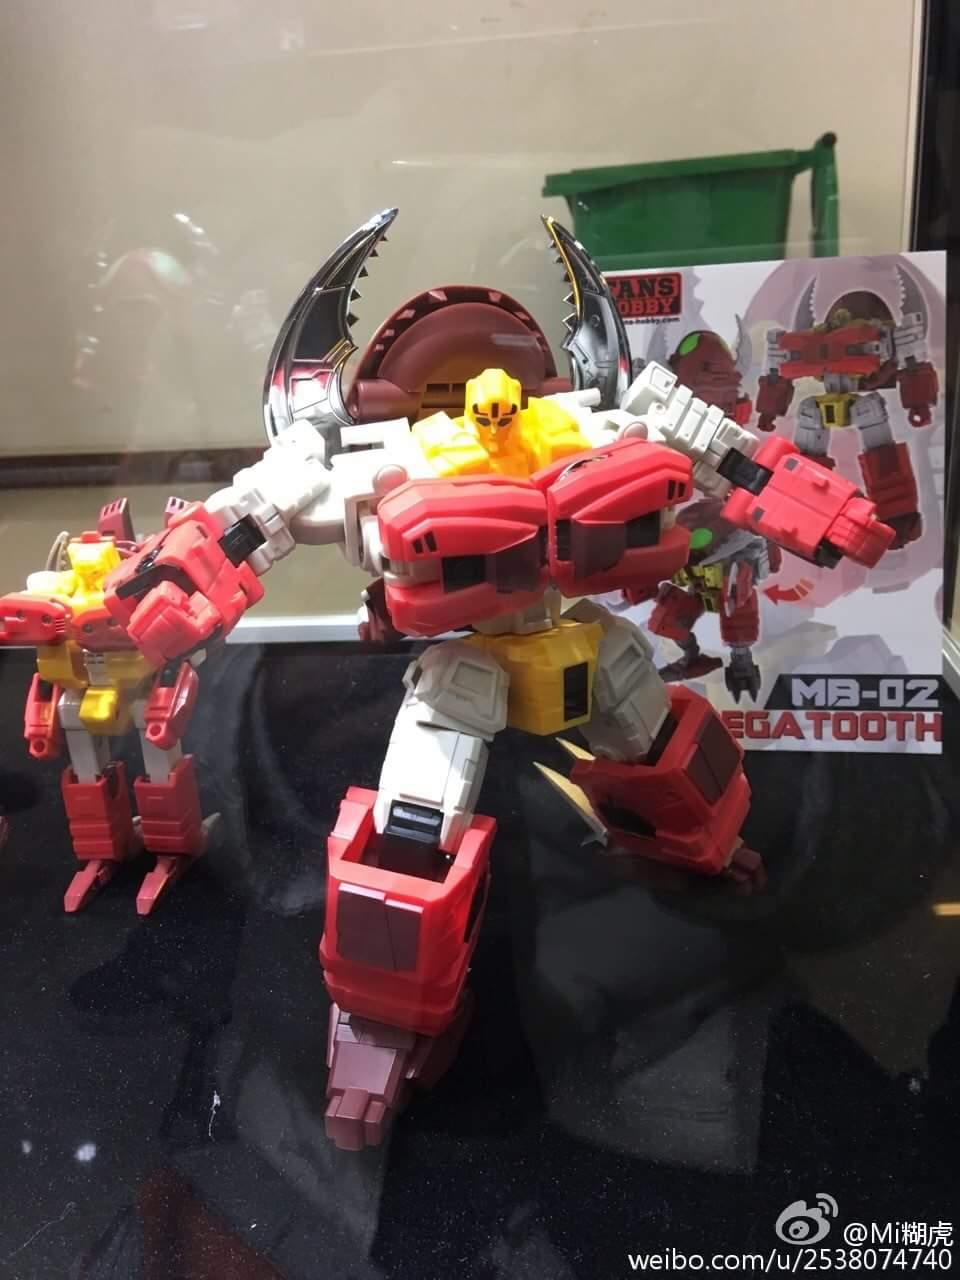 [FansHobby] Produit Tiers - Master Builder MB-02/03/05 - aka Monsterbots/Monstrebots O6A6Rv7Y